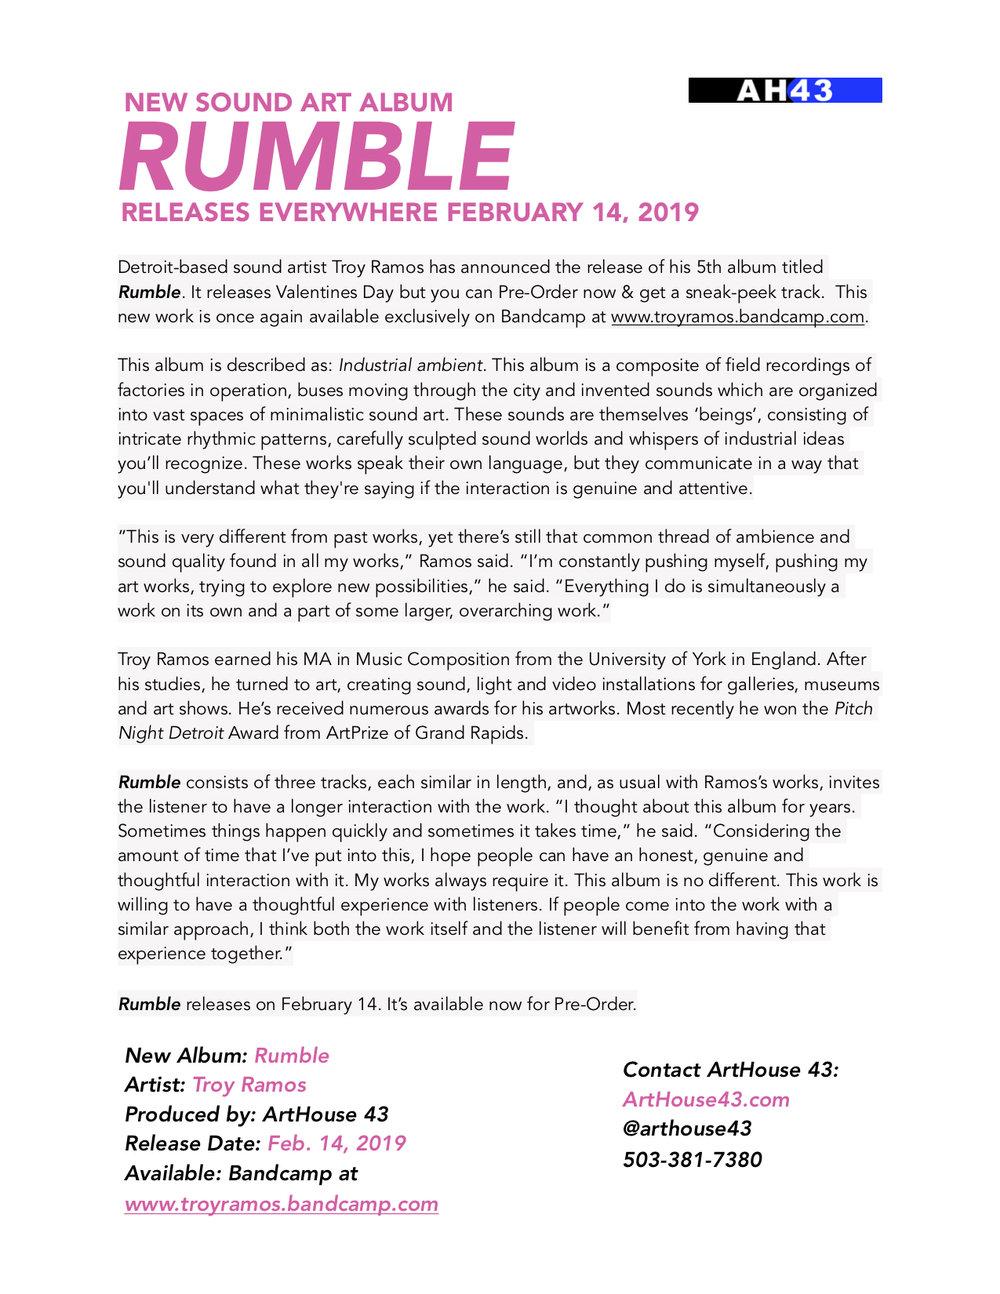 Rumble Album Press Release Troy Ramos ArtHouse 43 2019.jpg